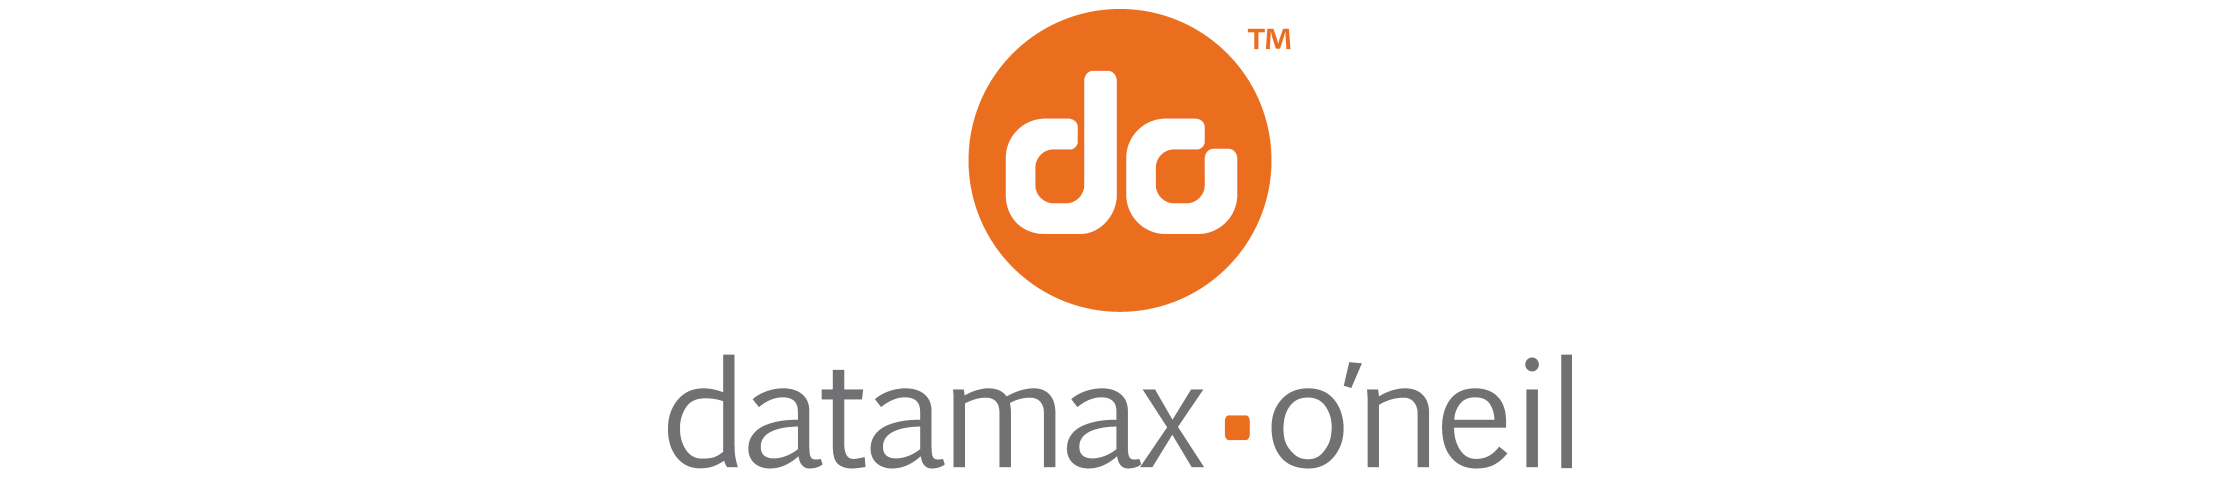 datamax_o